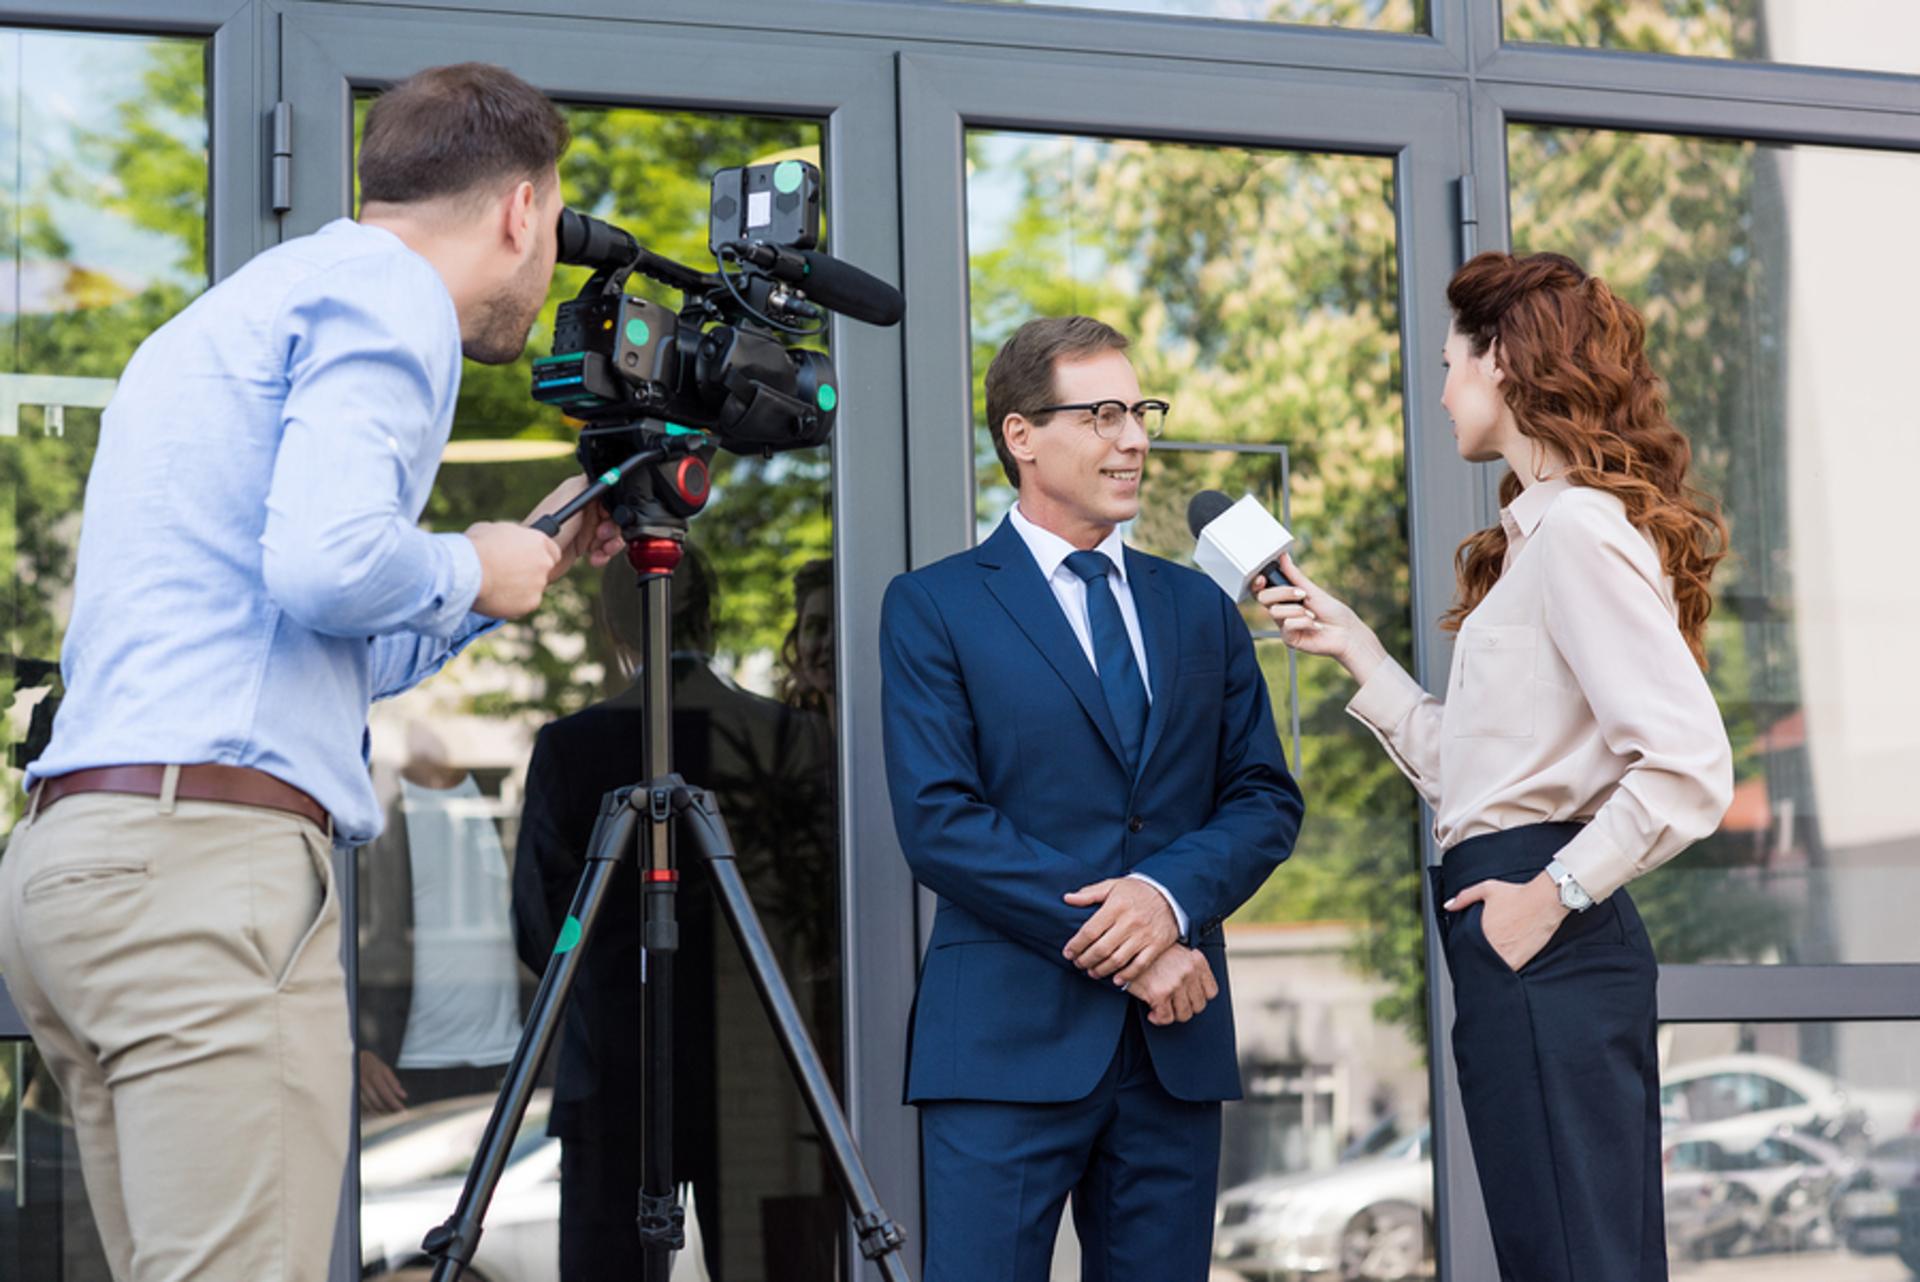 bigstock Cameraman And News Anchor Inte video marketing